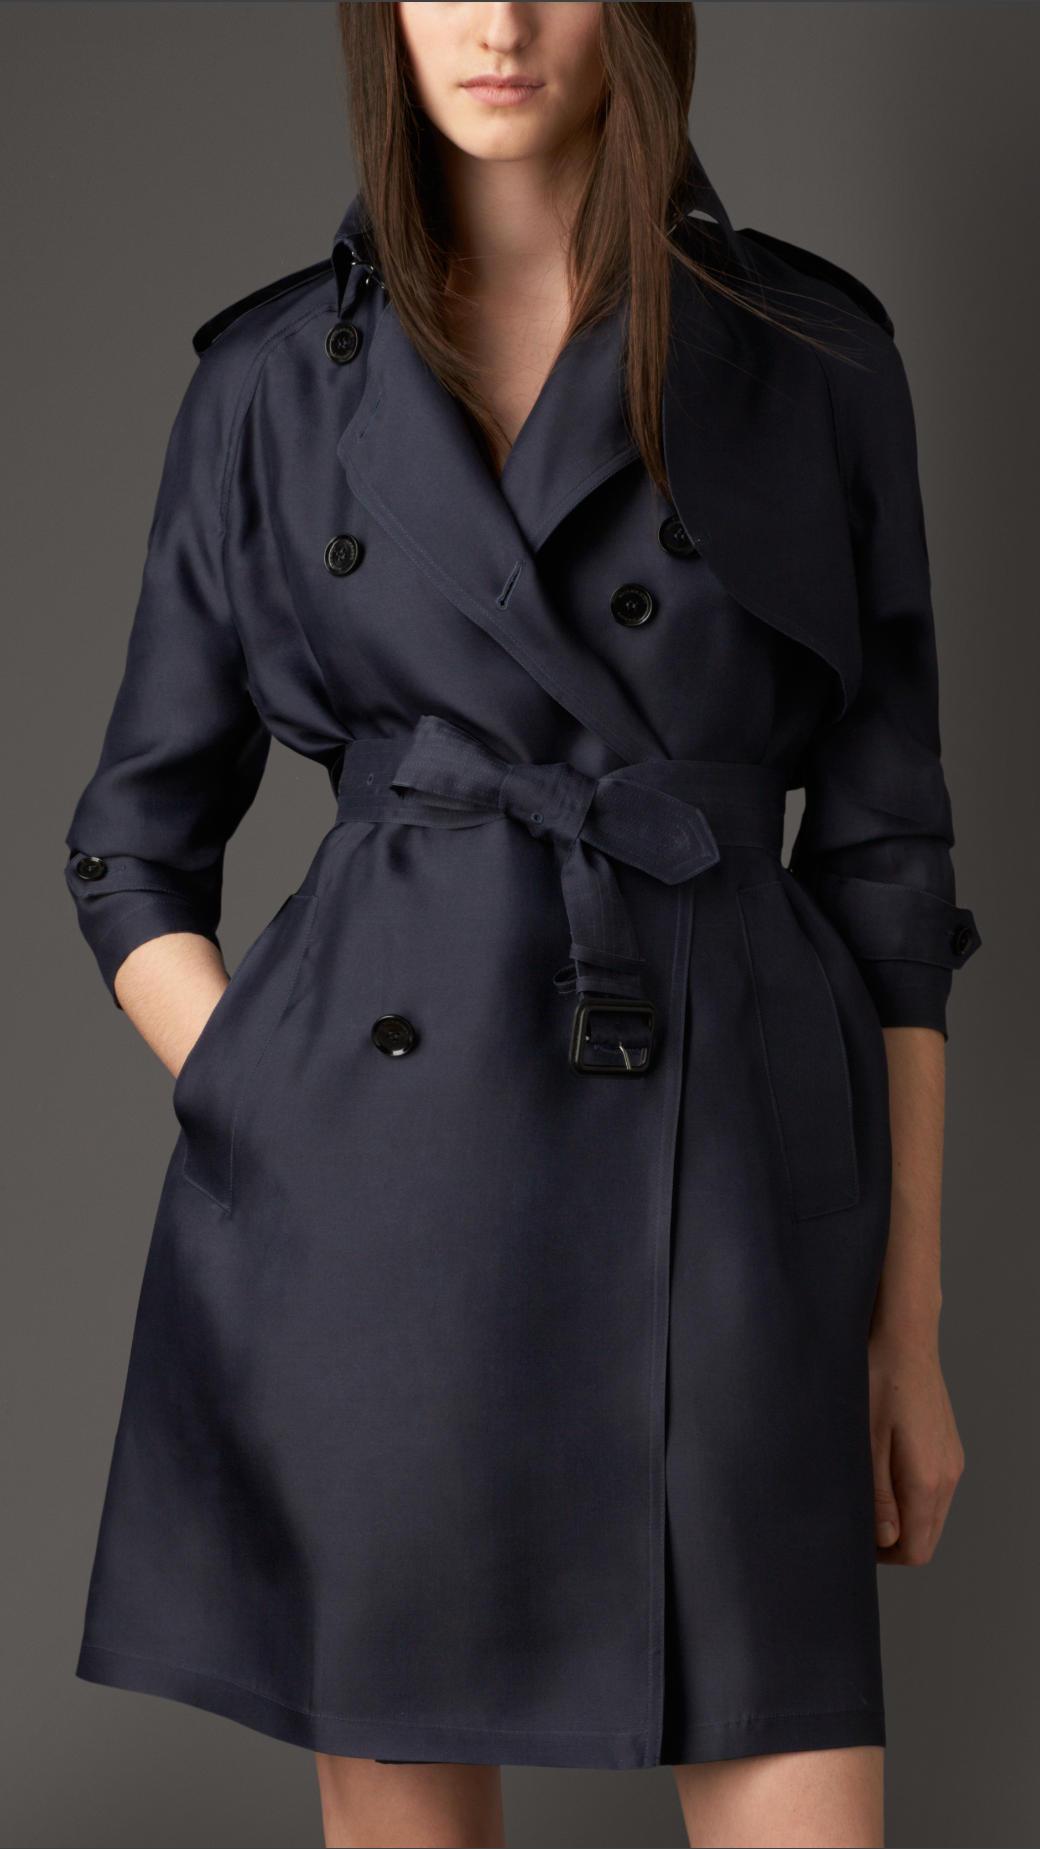 Burberry Long Showerproof Silk Trench Coat in Blue